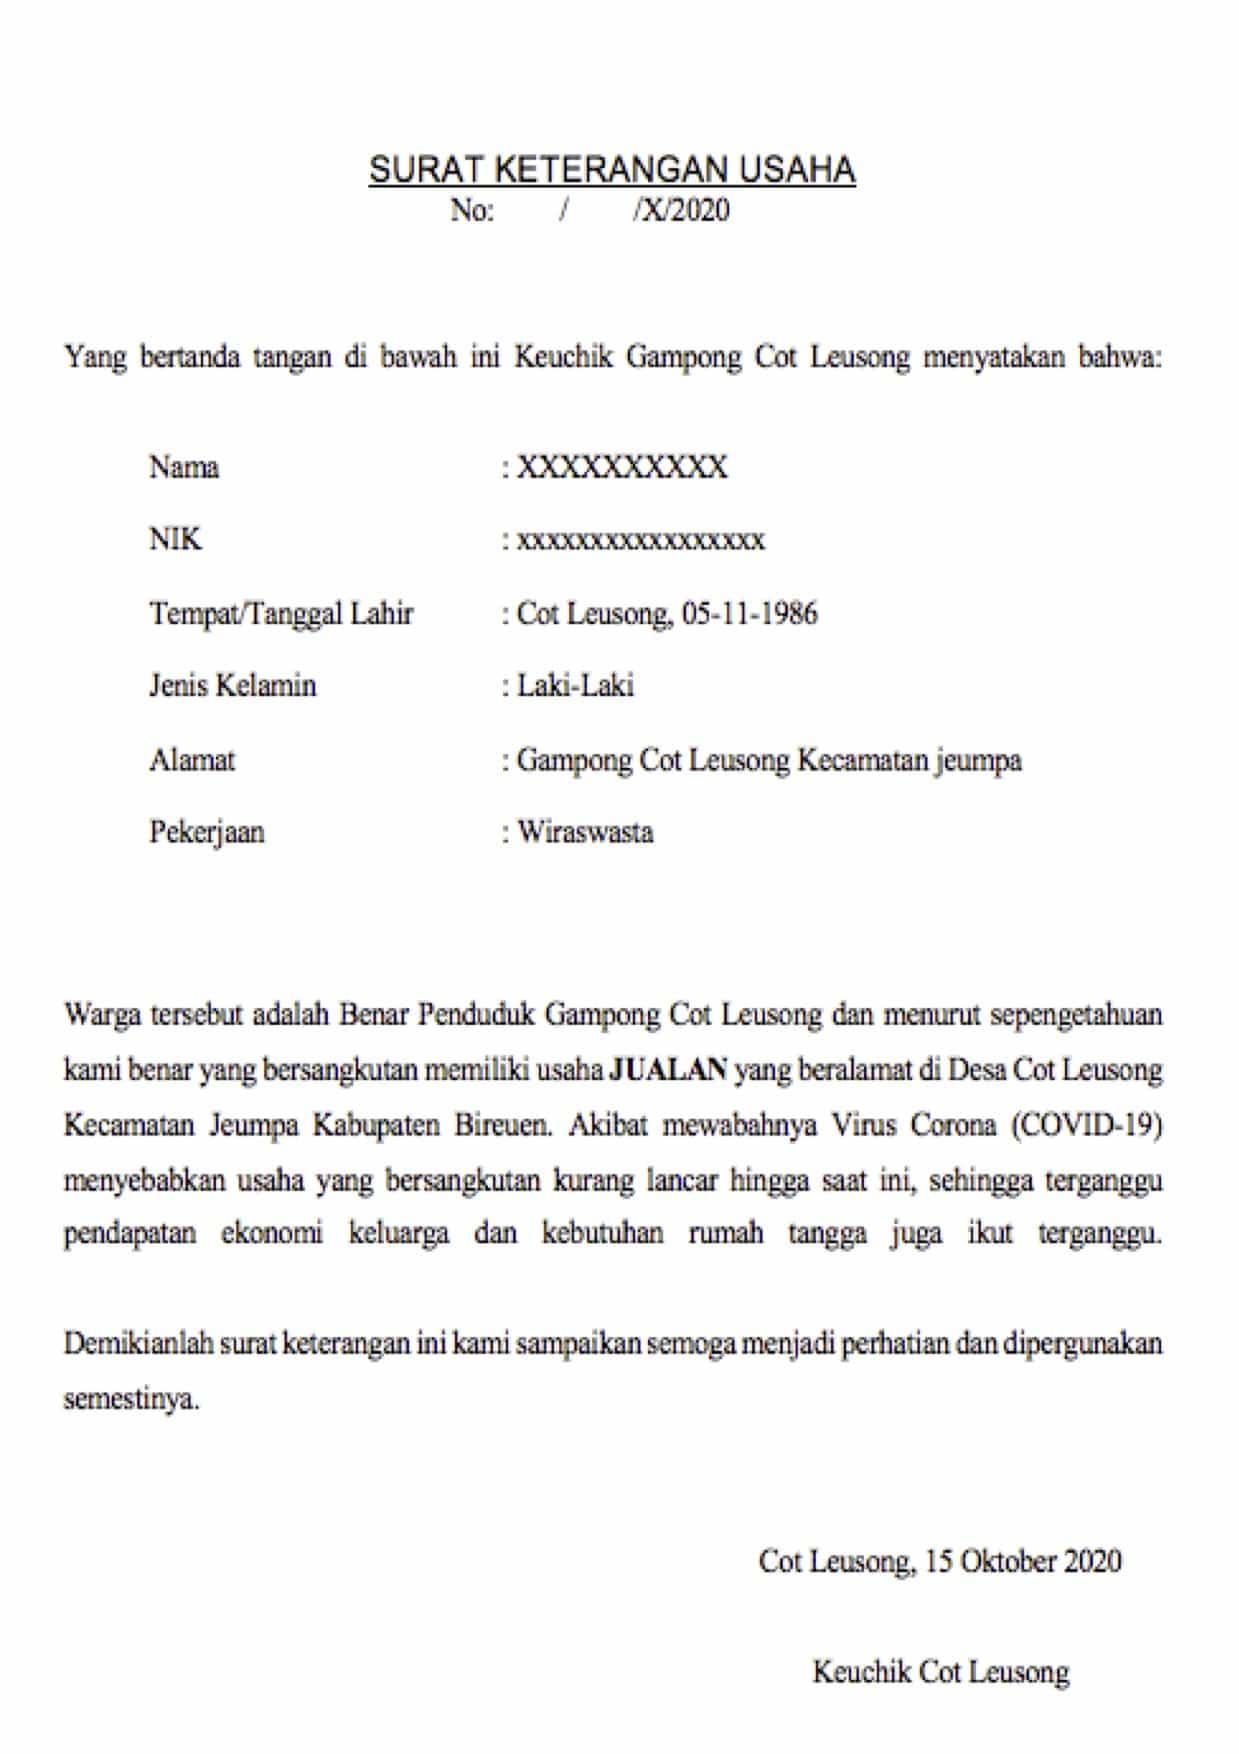 Contoh Surat Keterangan Usaha untuk UKM / UMKM / BPUM ...